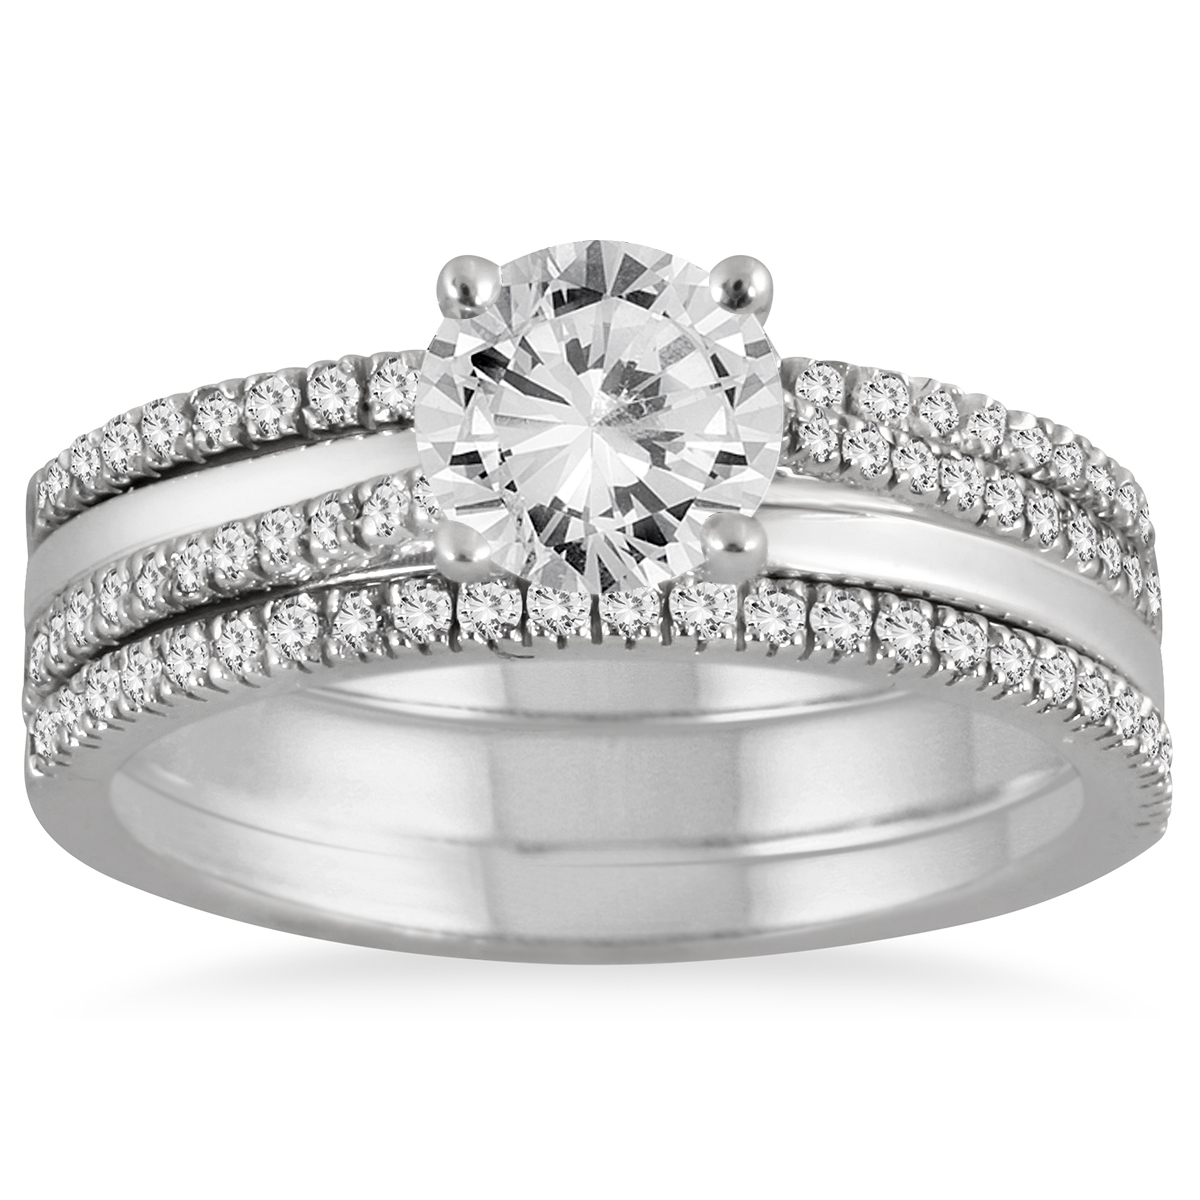 AGS Certified 1 2/5 Carat TW Diamond